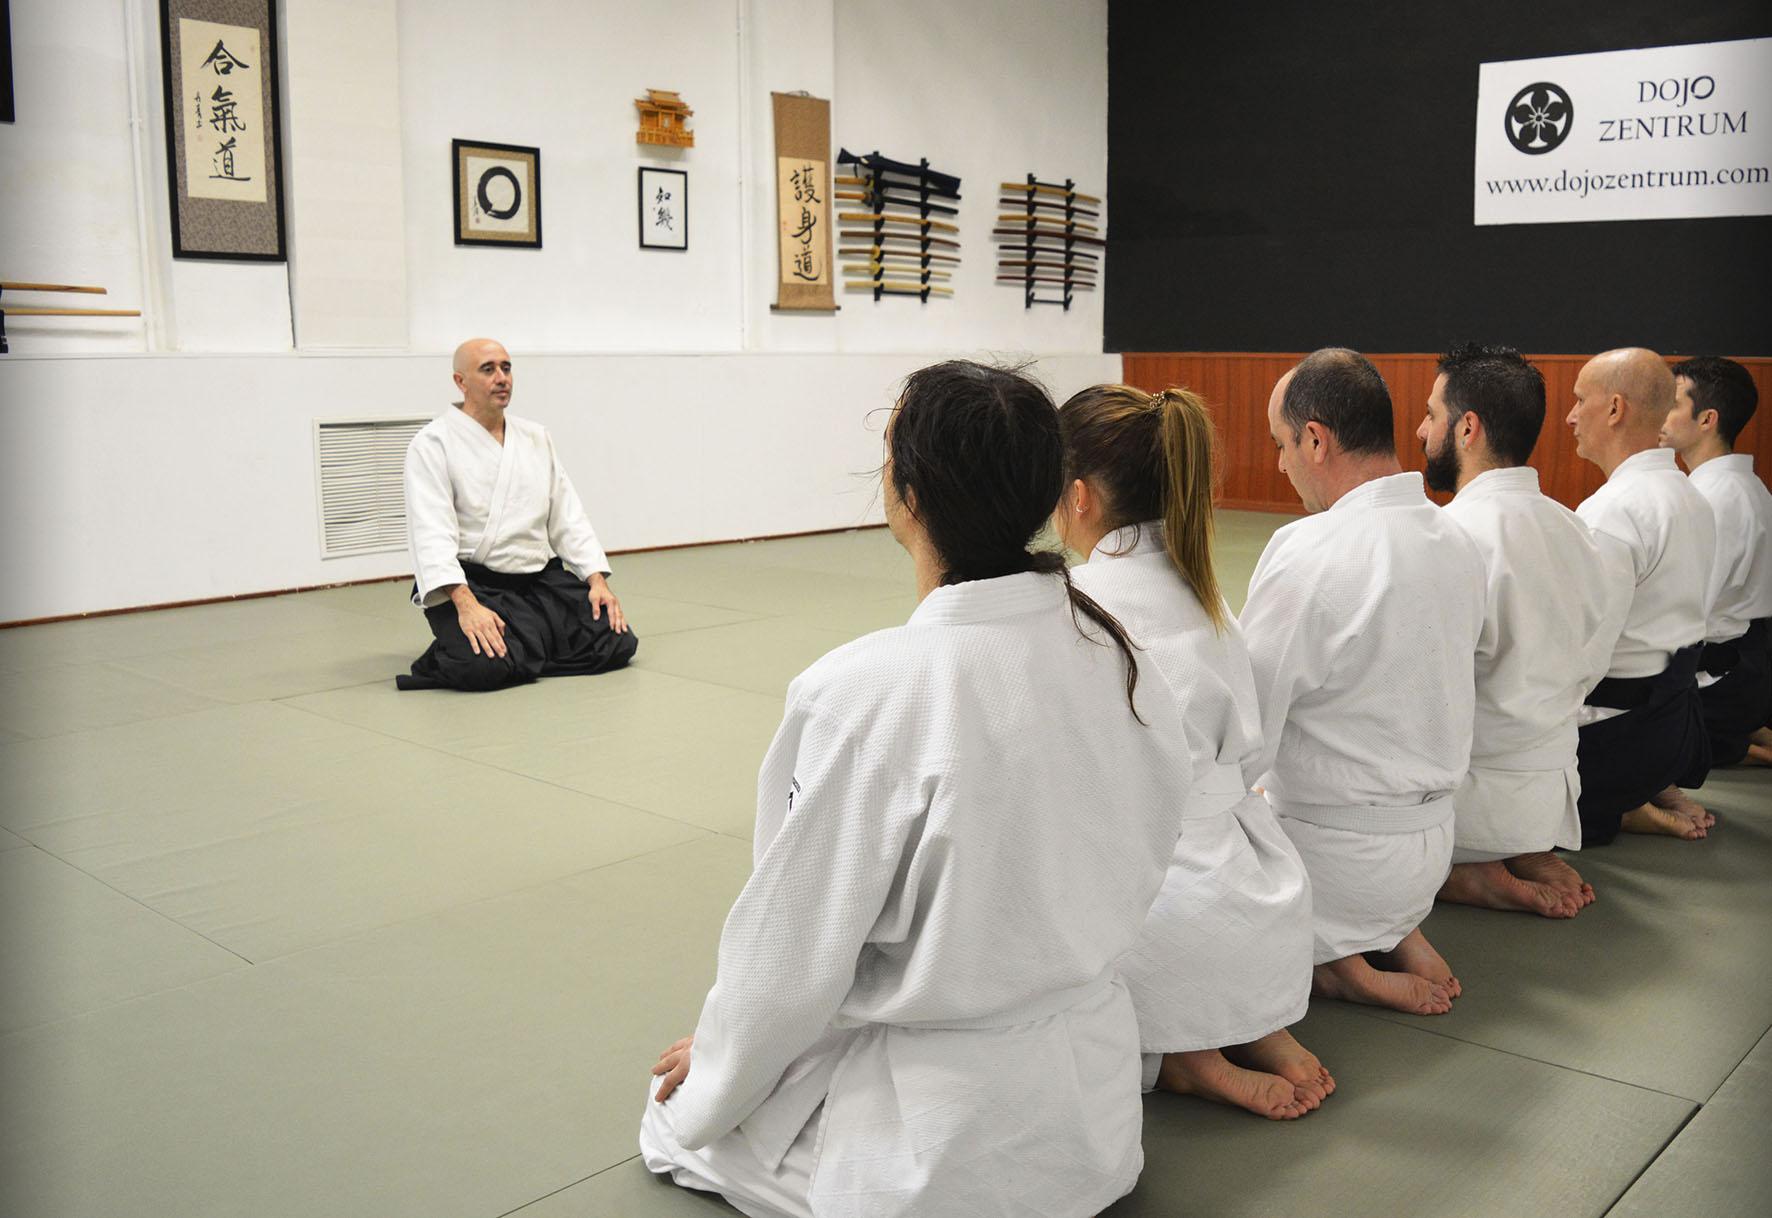 Aikido, Dojos Horario de Clases. Clase colectiva